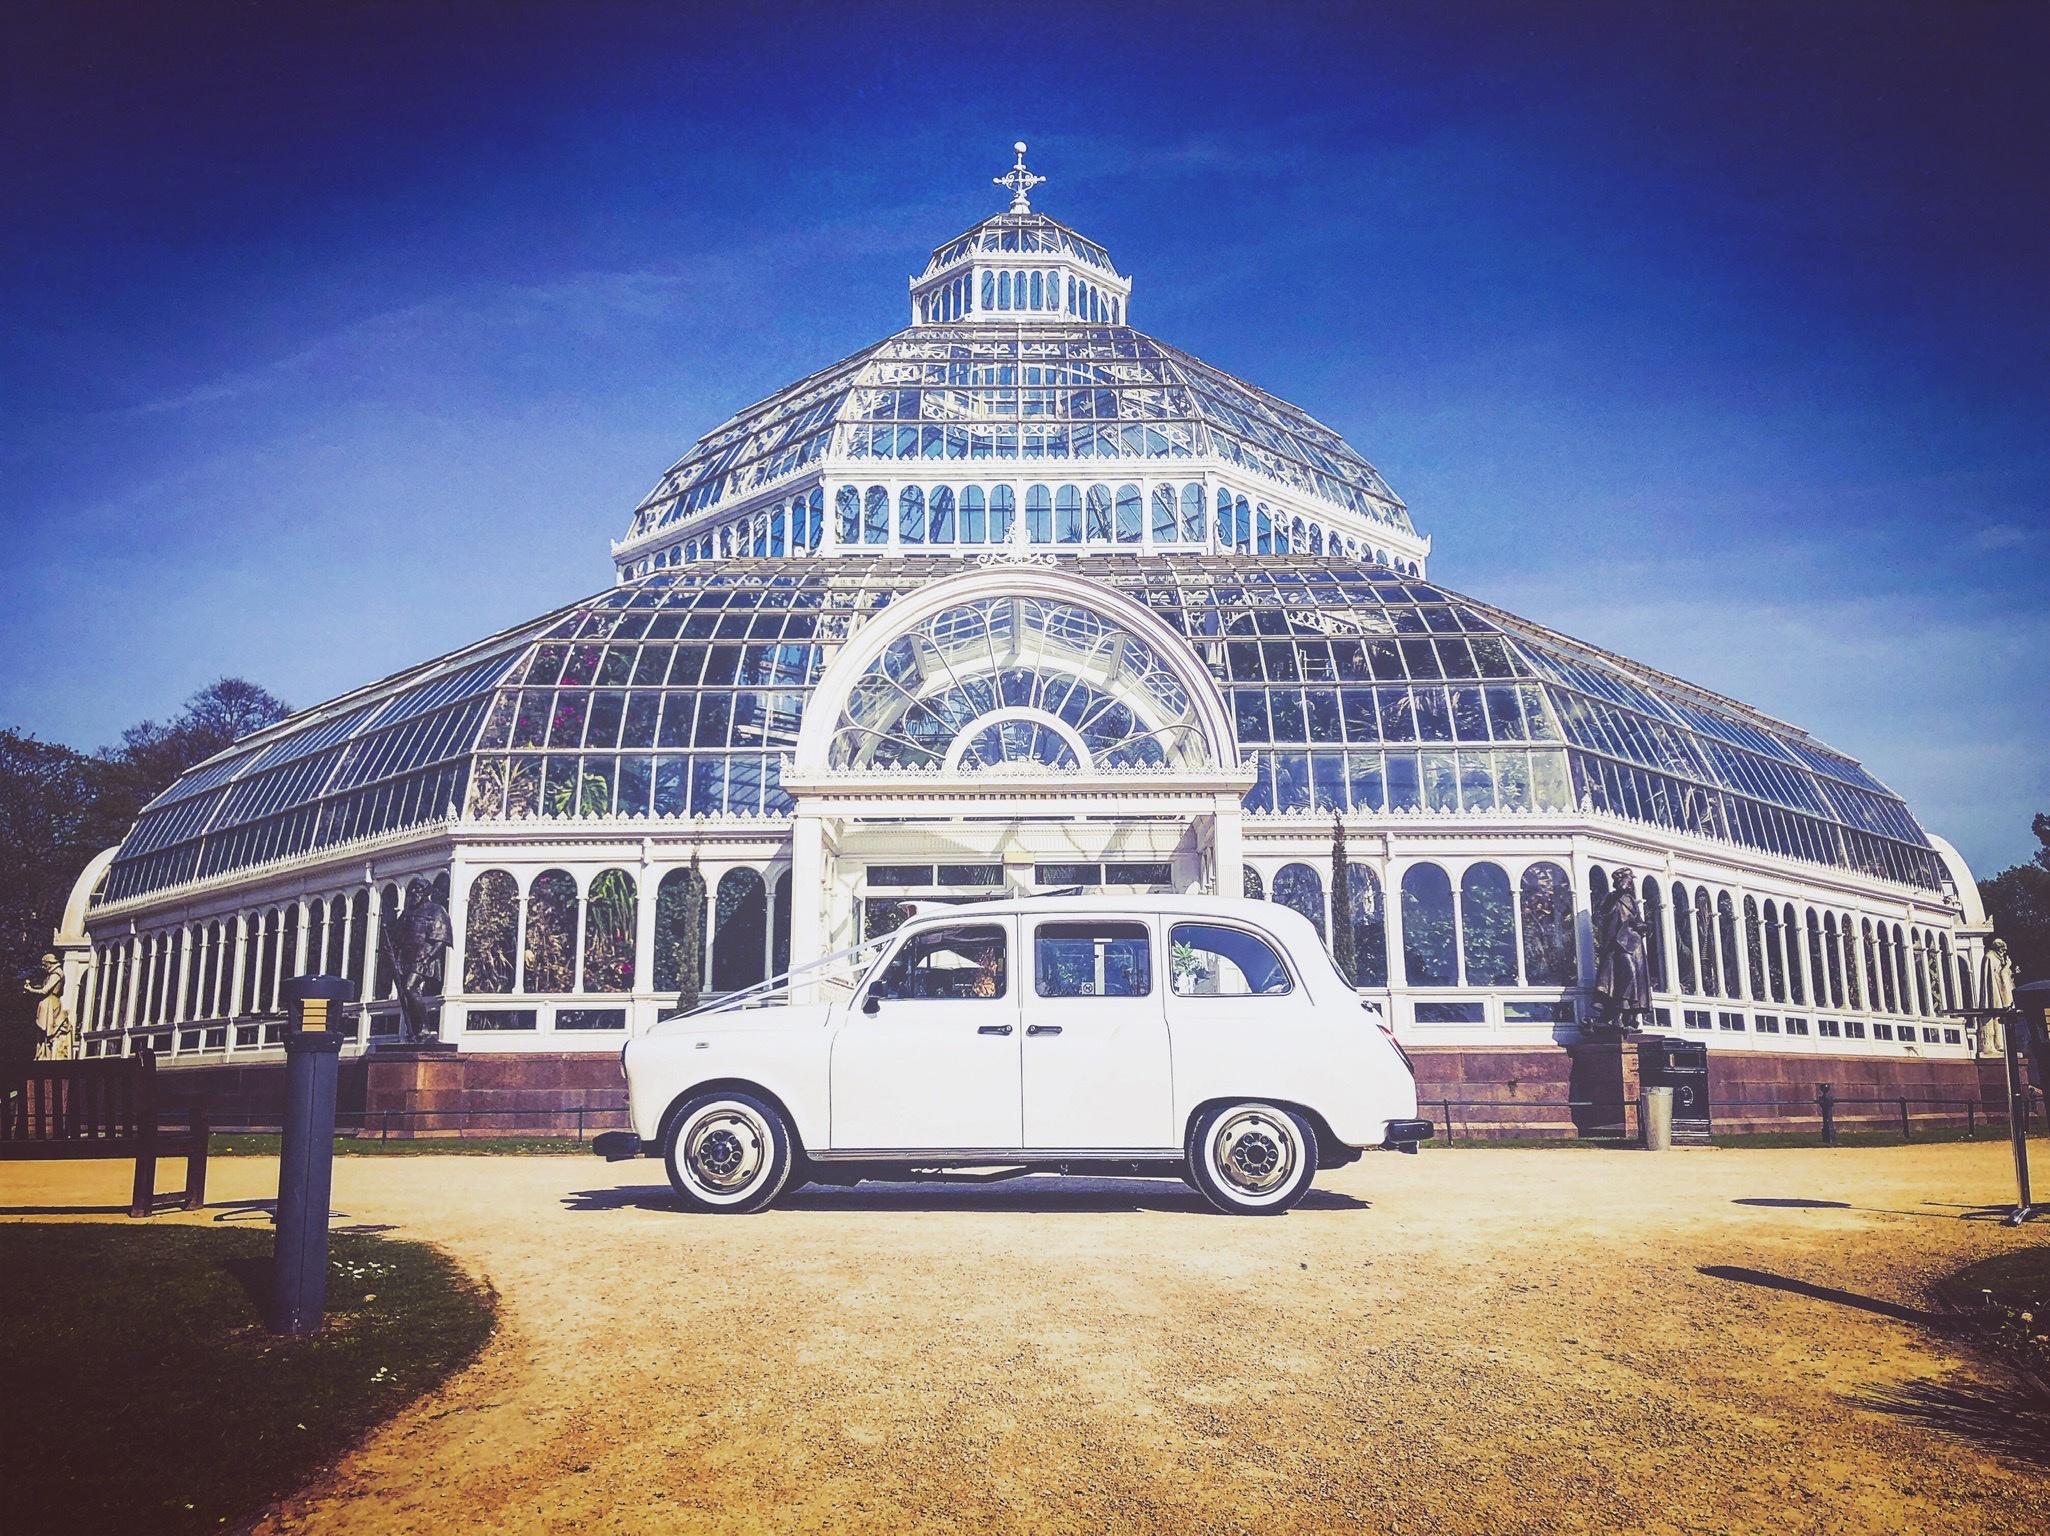 https://0501.nccdn.net/4_2/000/000/060/85f/classic-wedding-car-liverpool-2050x1536.jpg